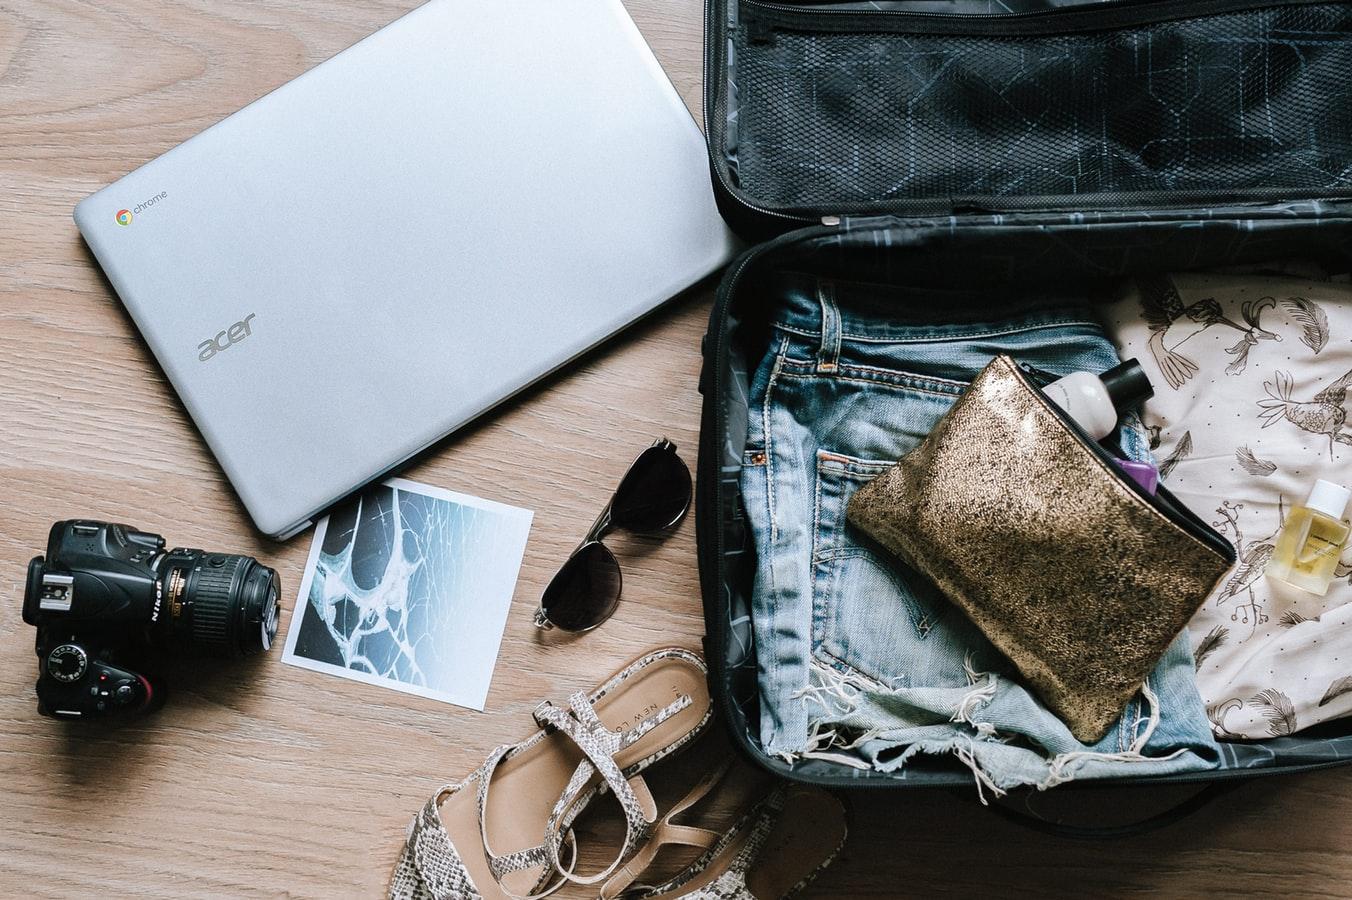 EZOZ 澳洲留学生平台 | 华人网 网络博客